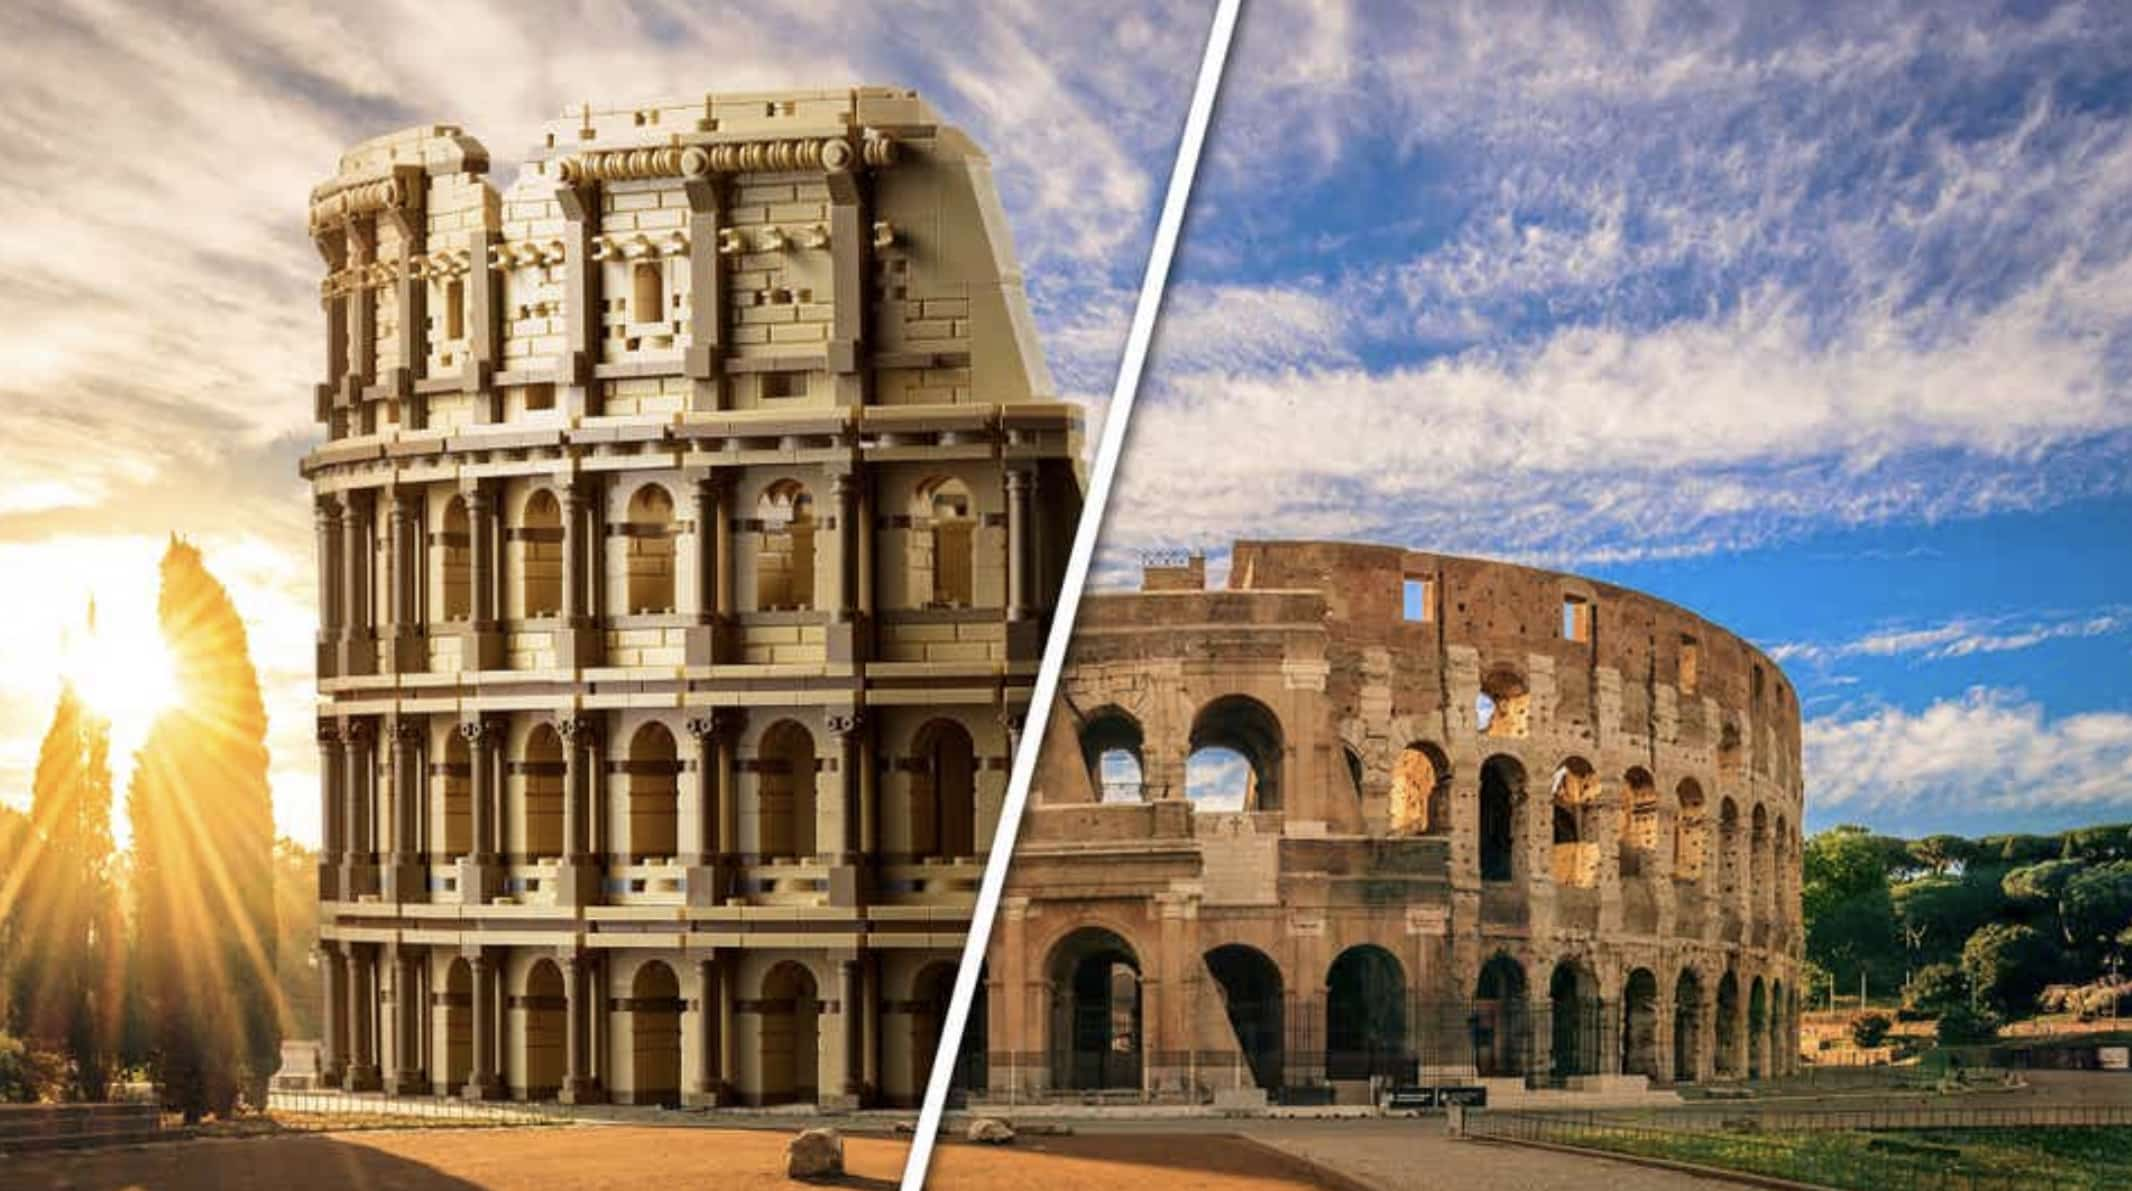 Set del Coliseo Romano de Lego